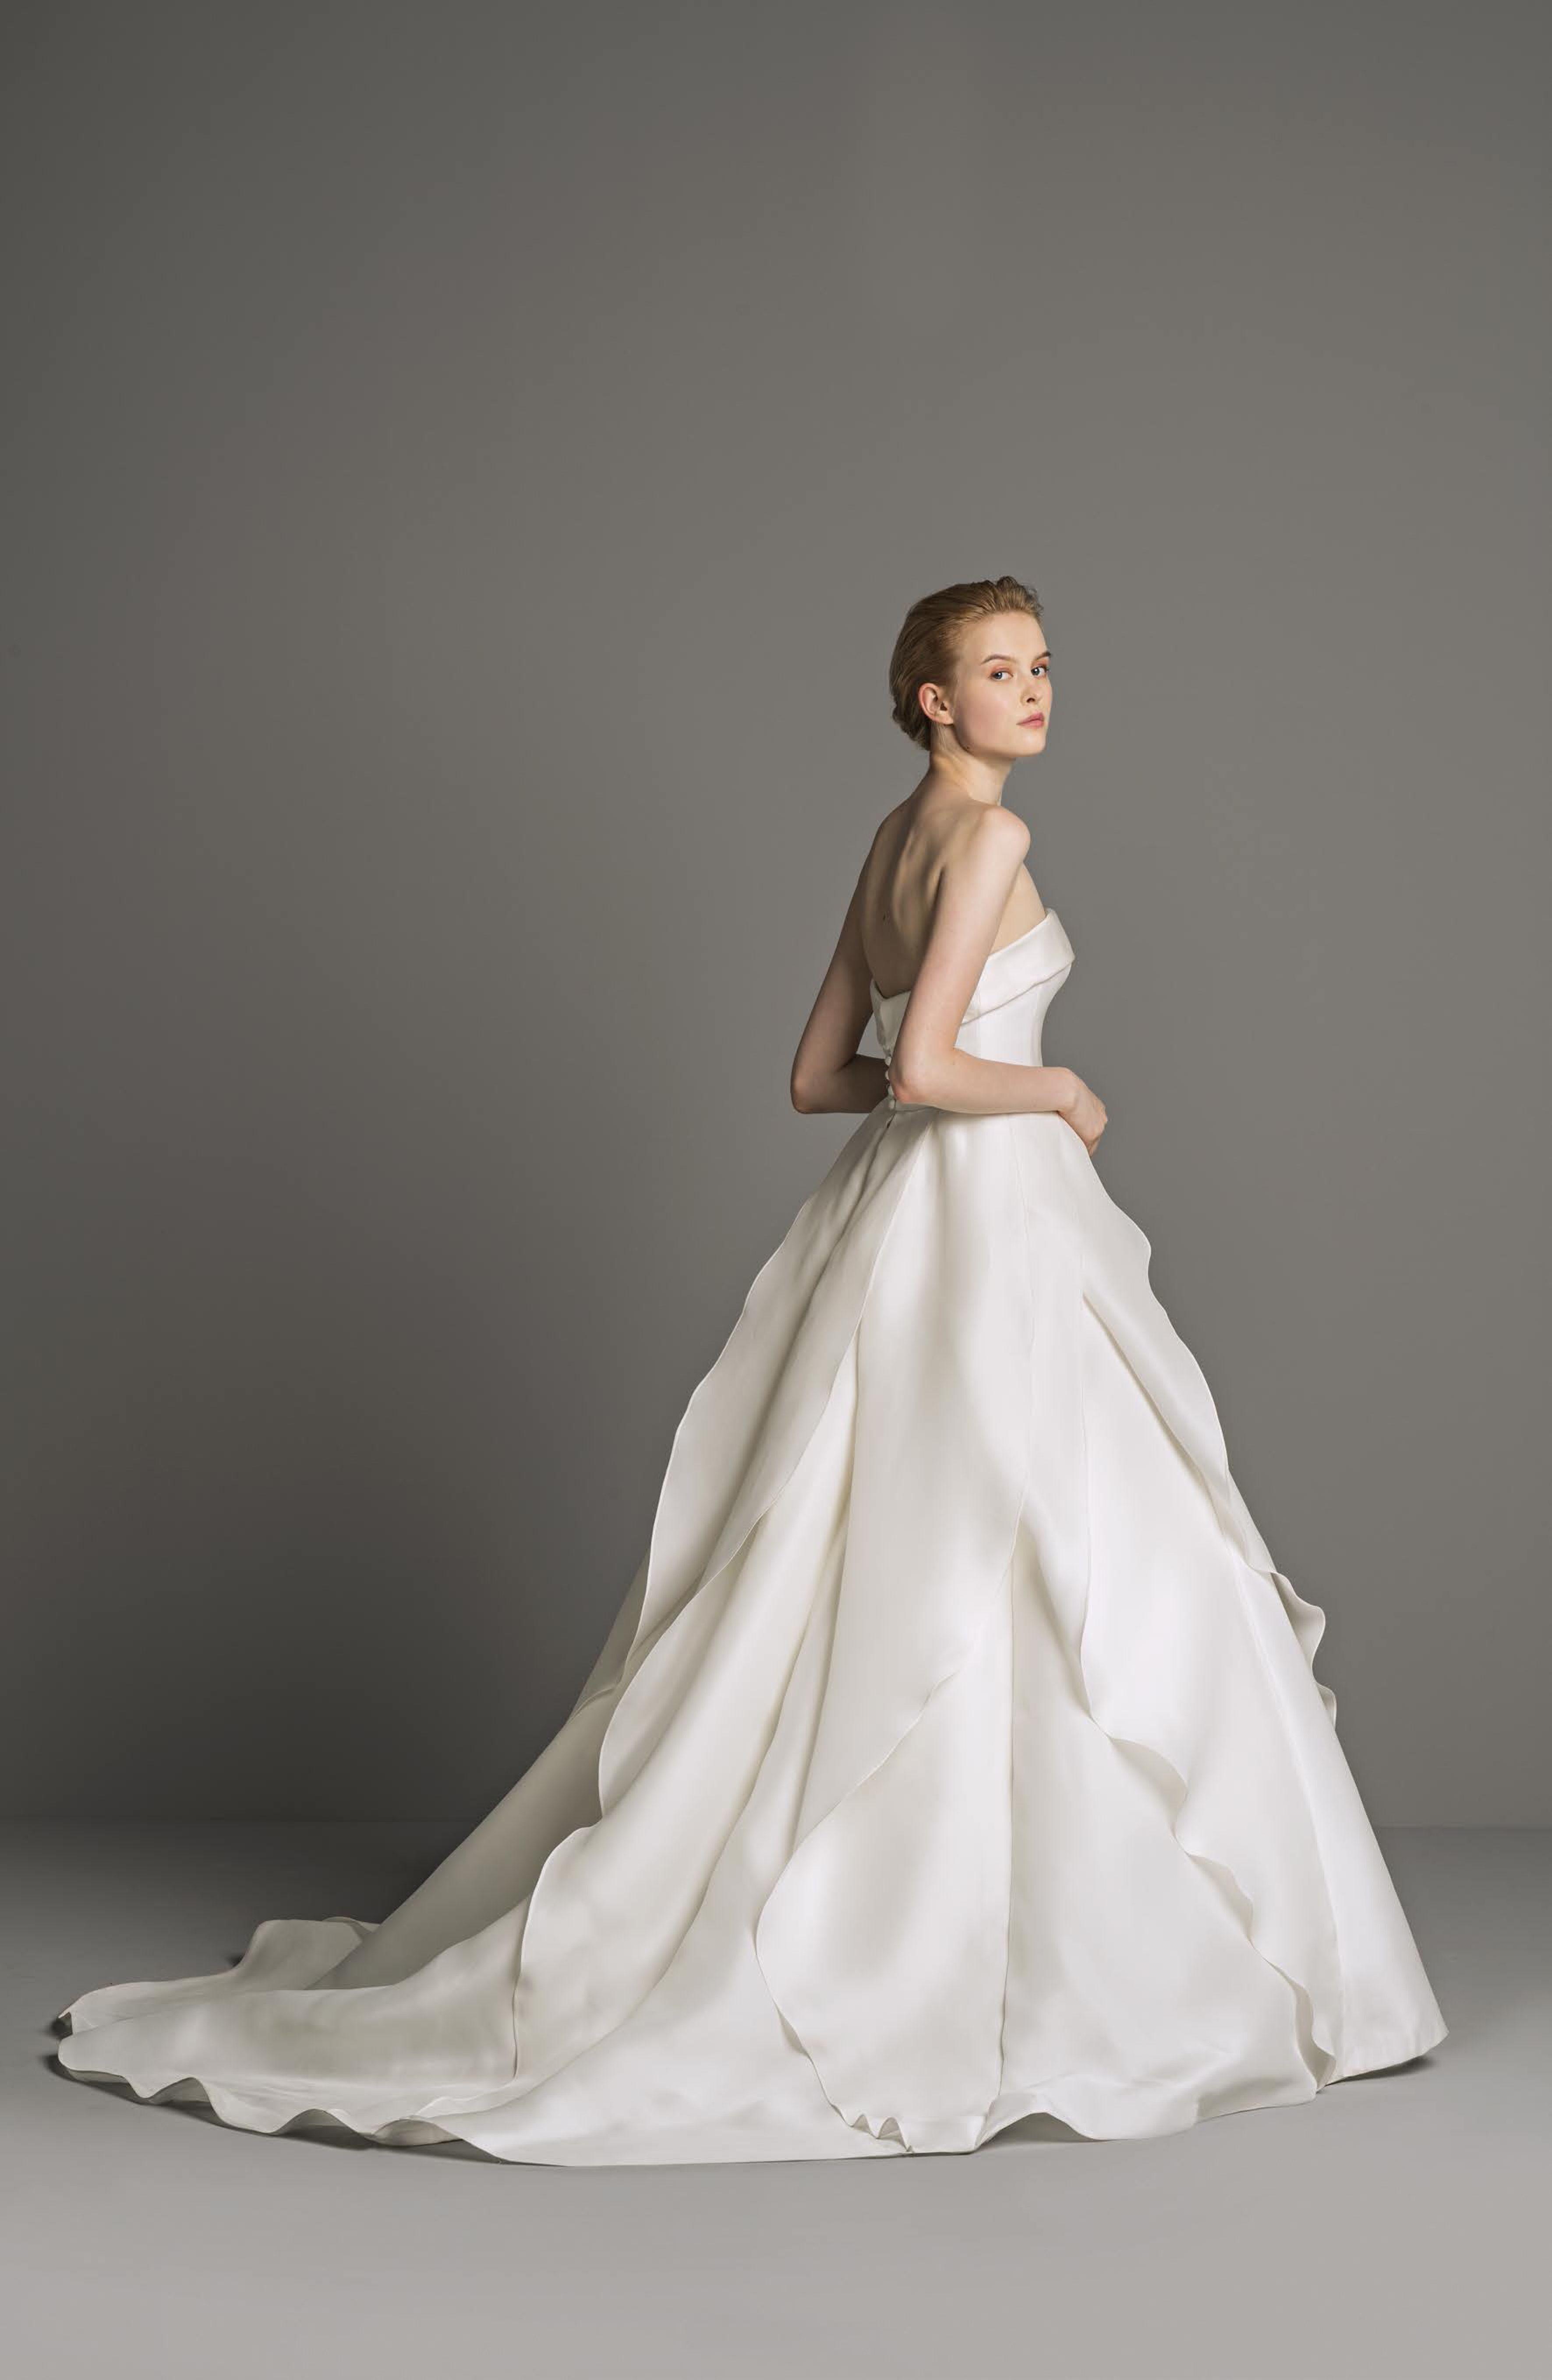 Abiti Da Cerimonia Italiani.Francis Peter Langner Weddingdress Wedding Dress Prices